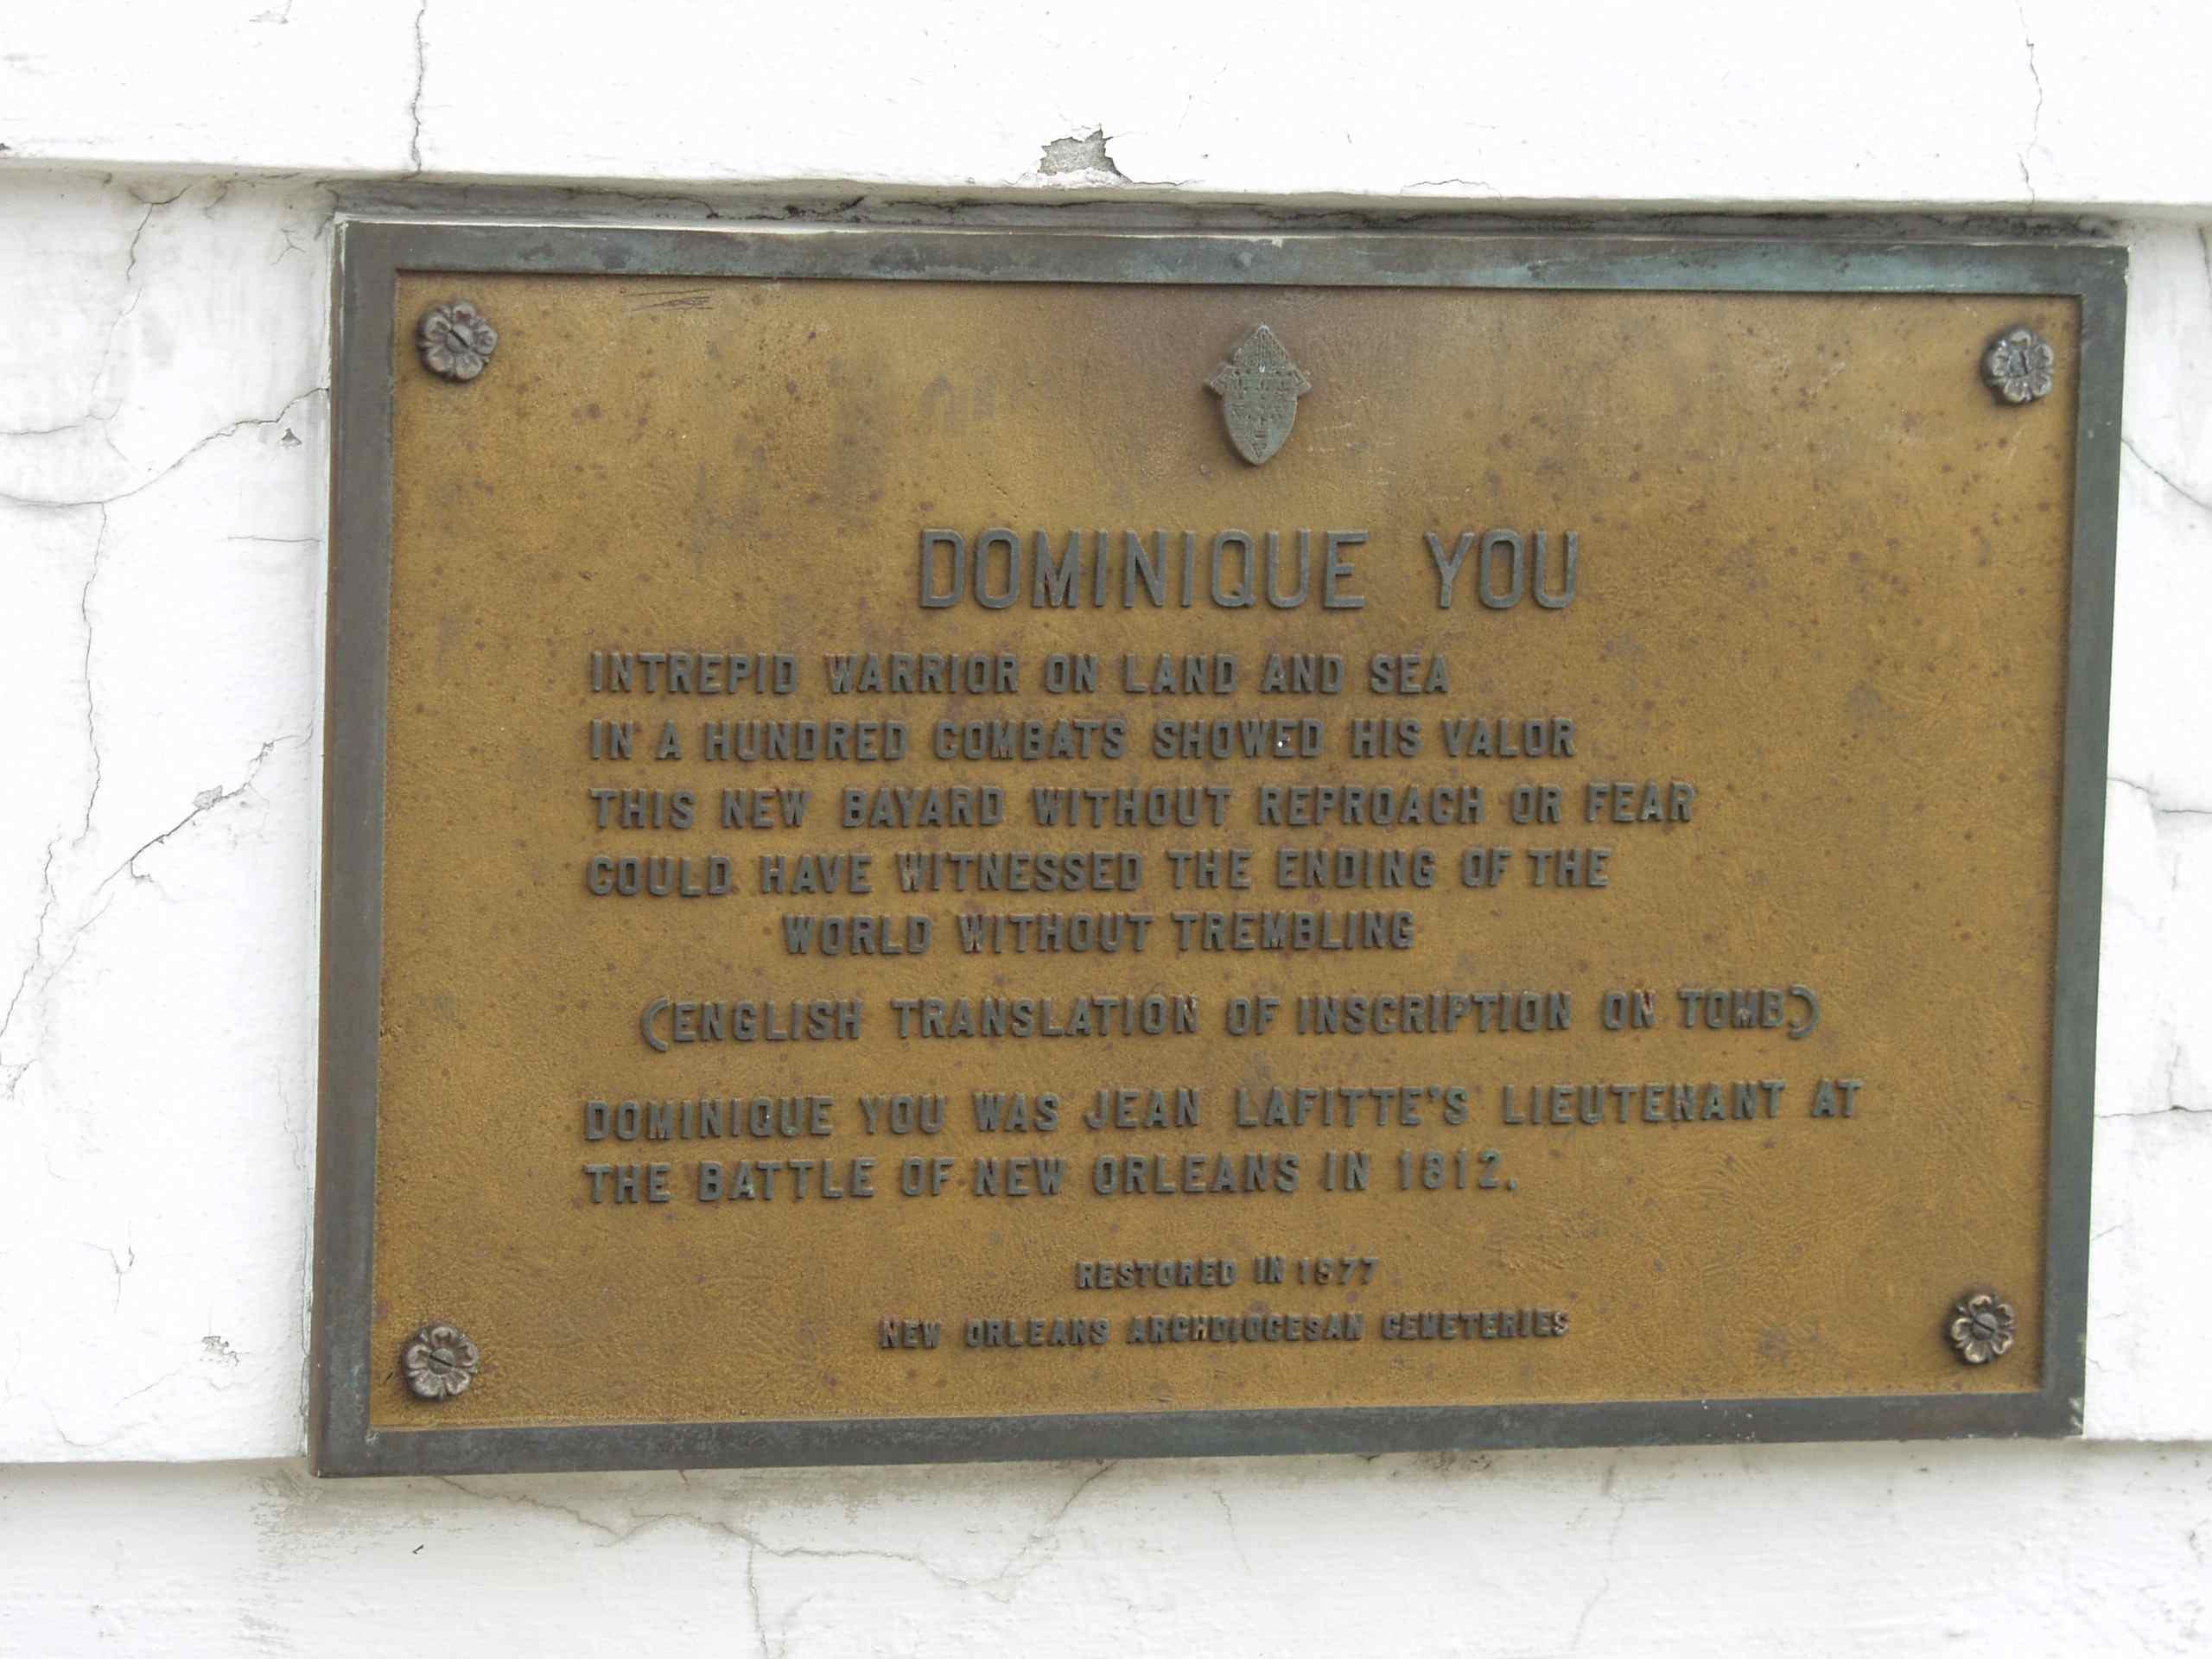 Dominique You